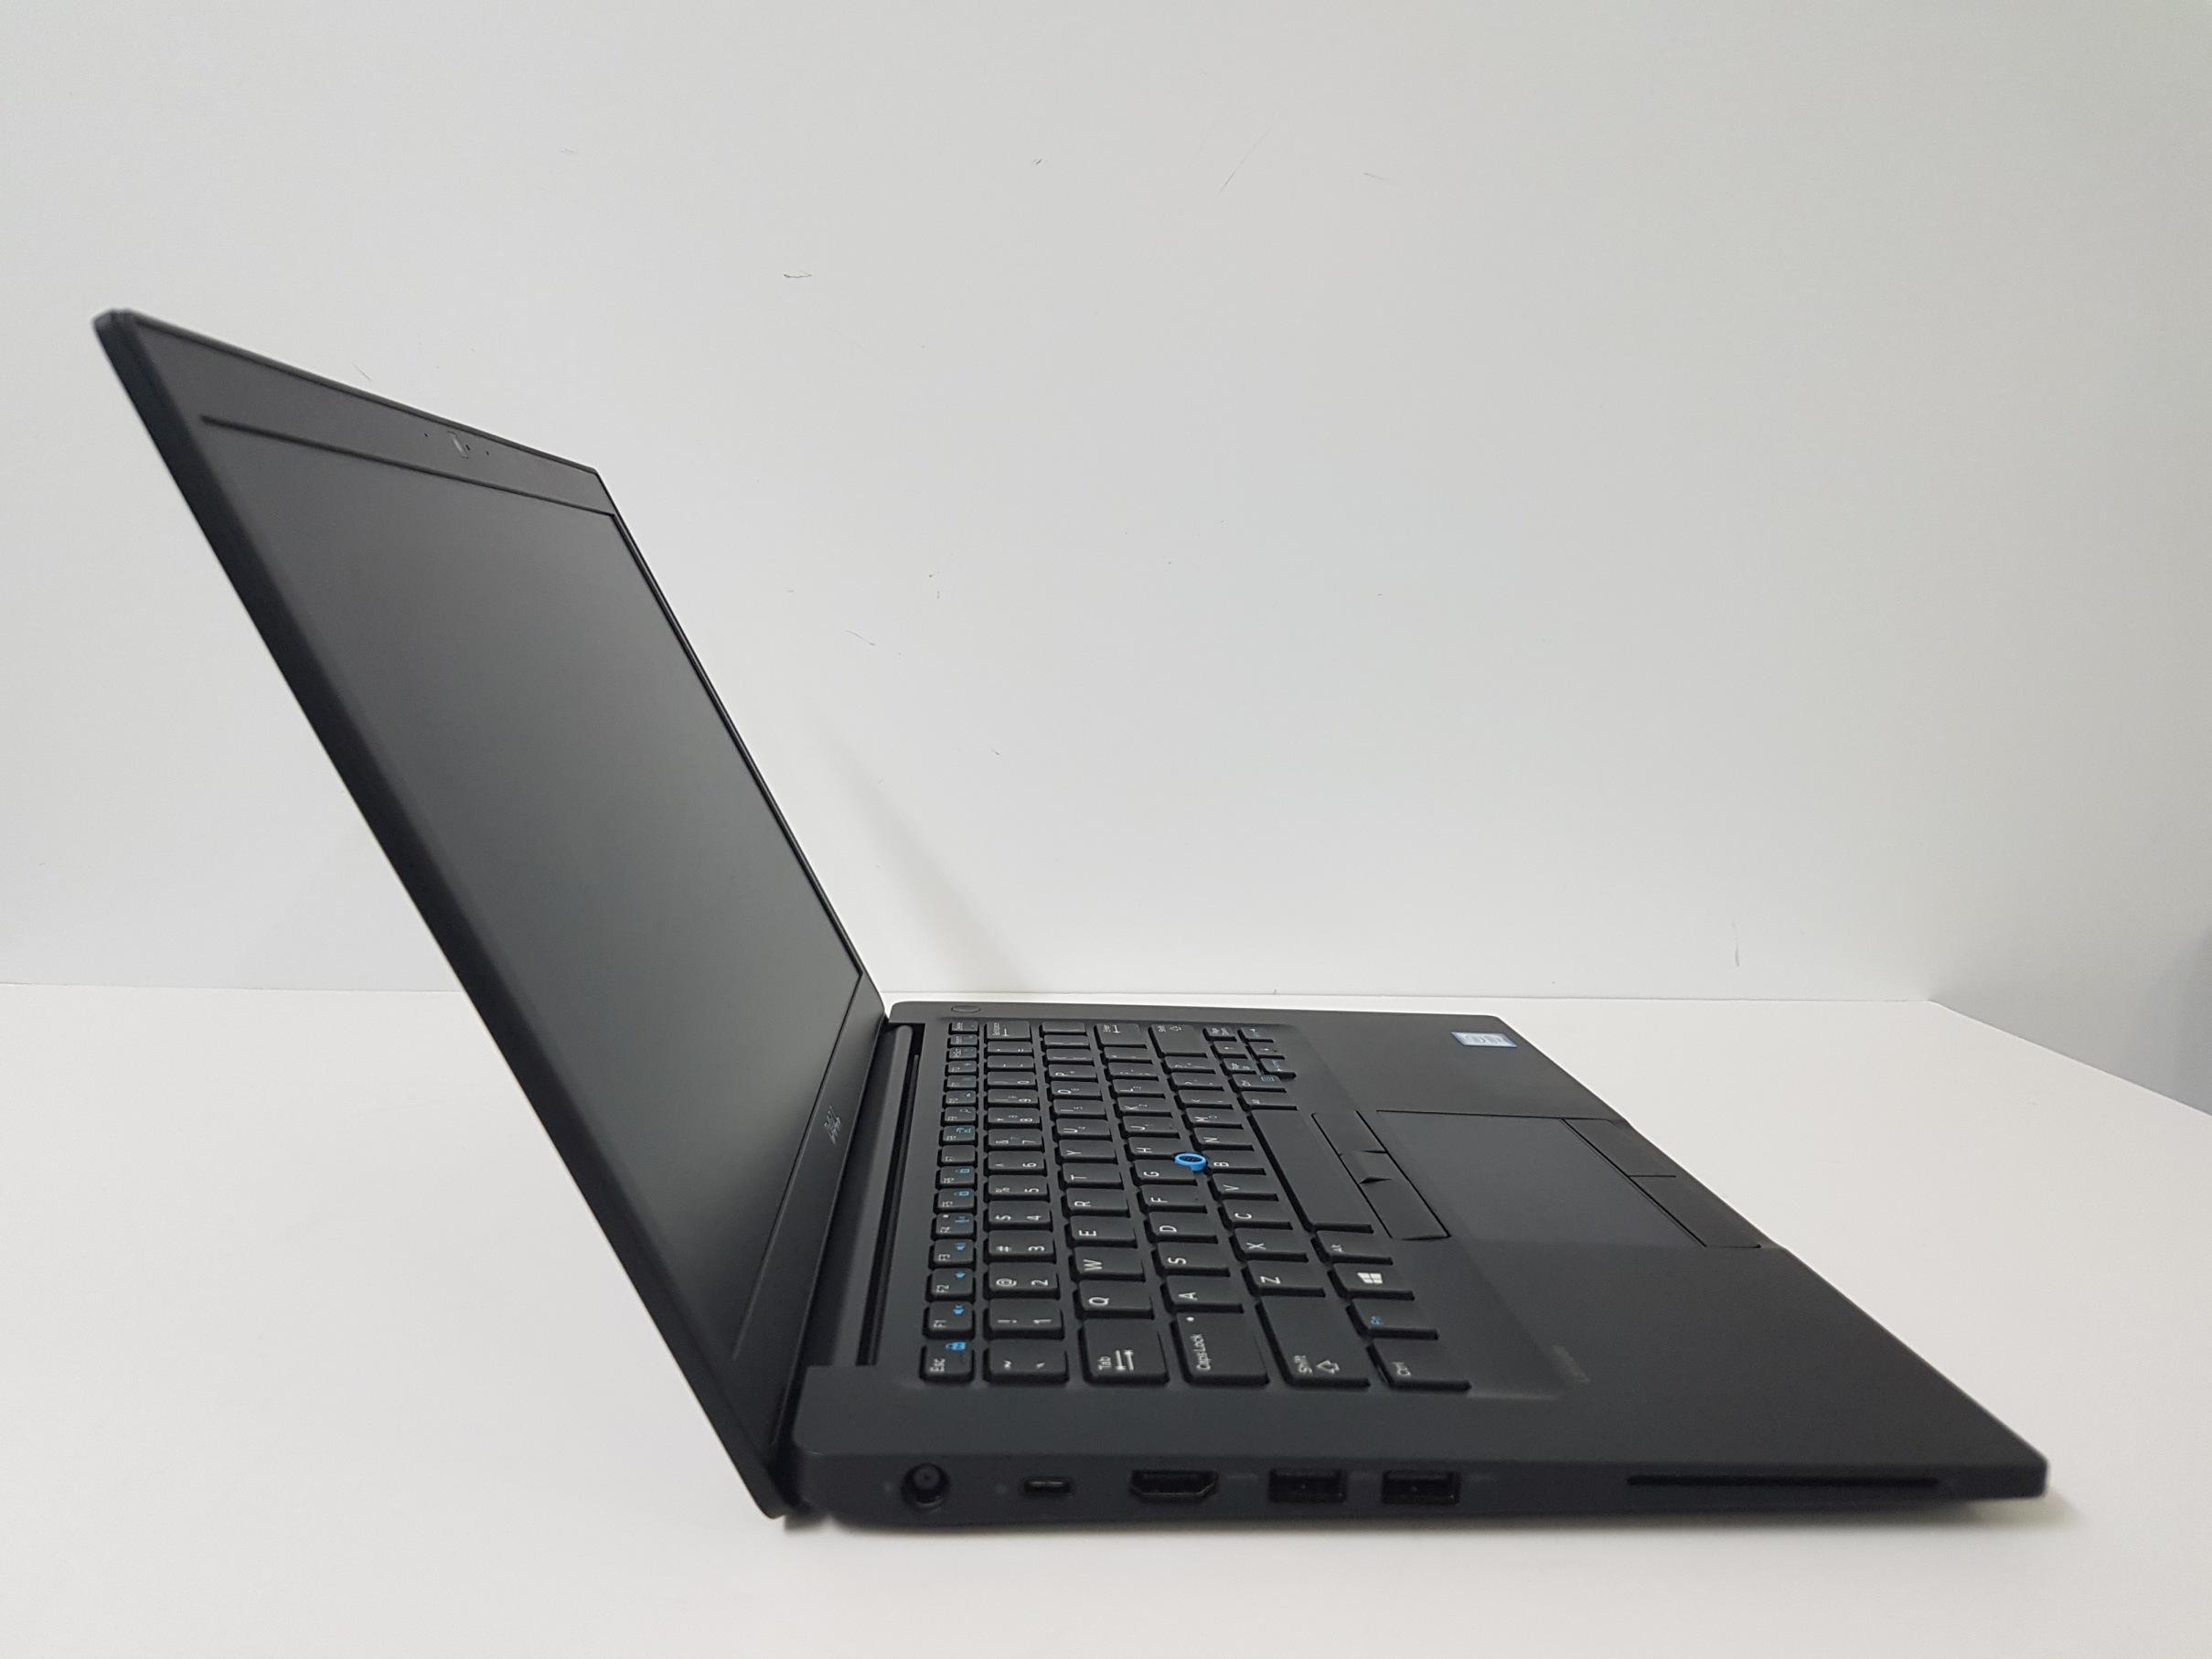 Laptop mỏng nhẹ Dell Latitude 7480 core i5-6300U , Ram 8G , 256G SSD , Màn 14 inchs FHD IPS